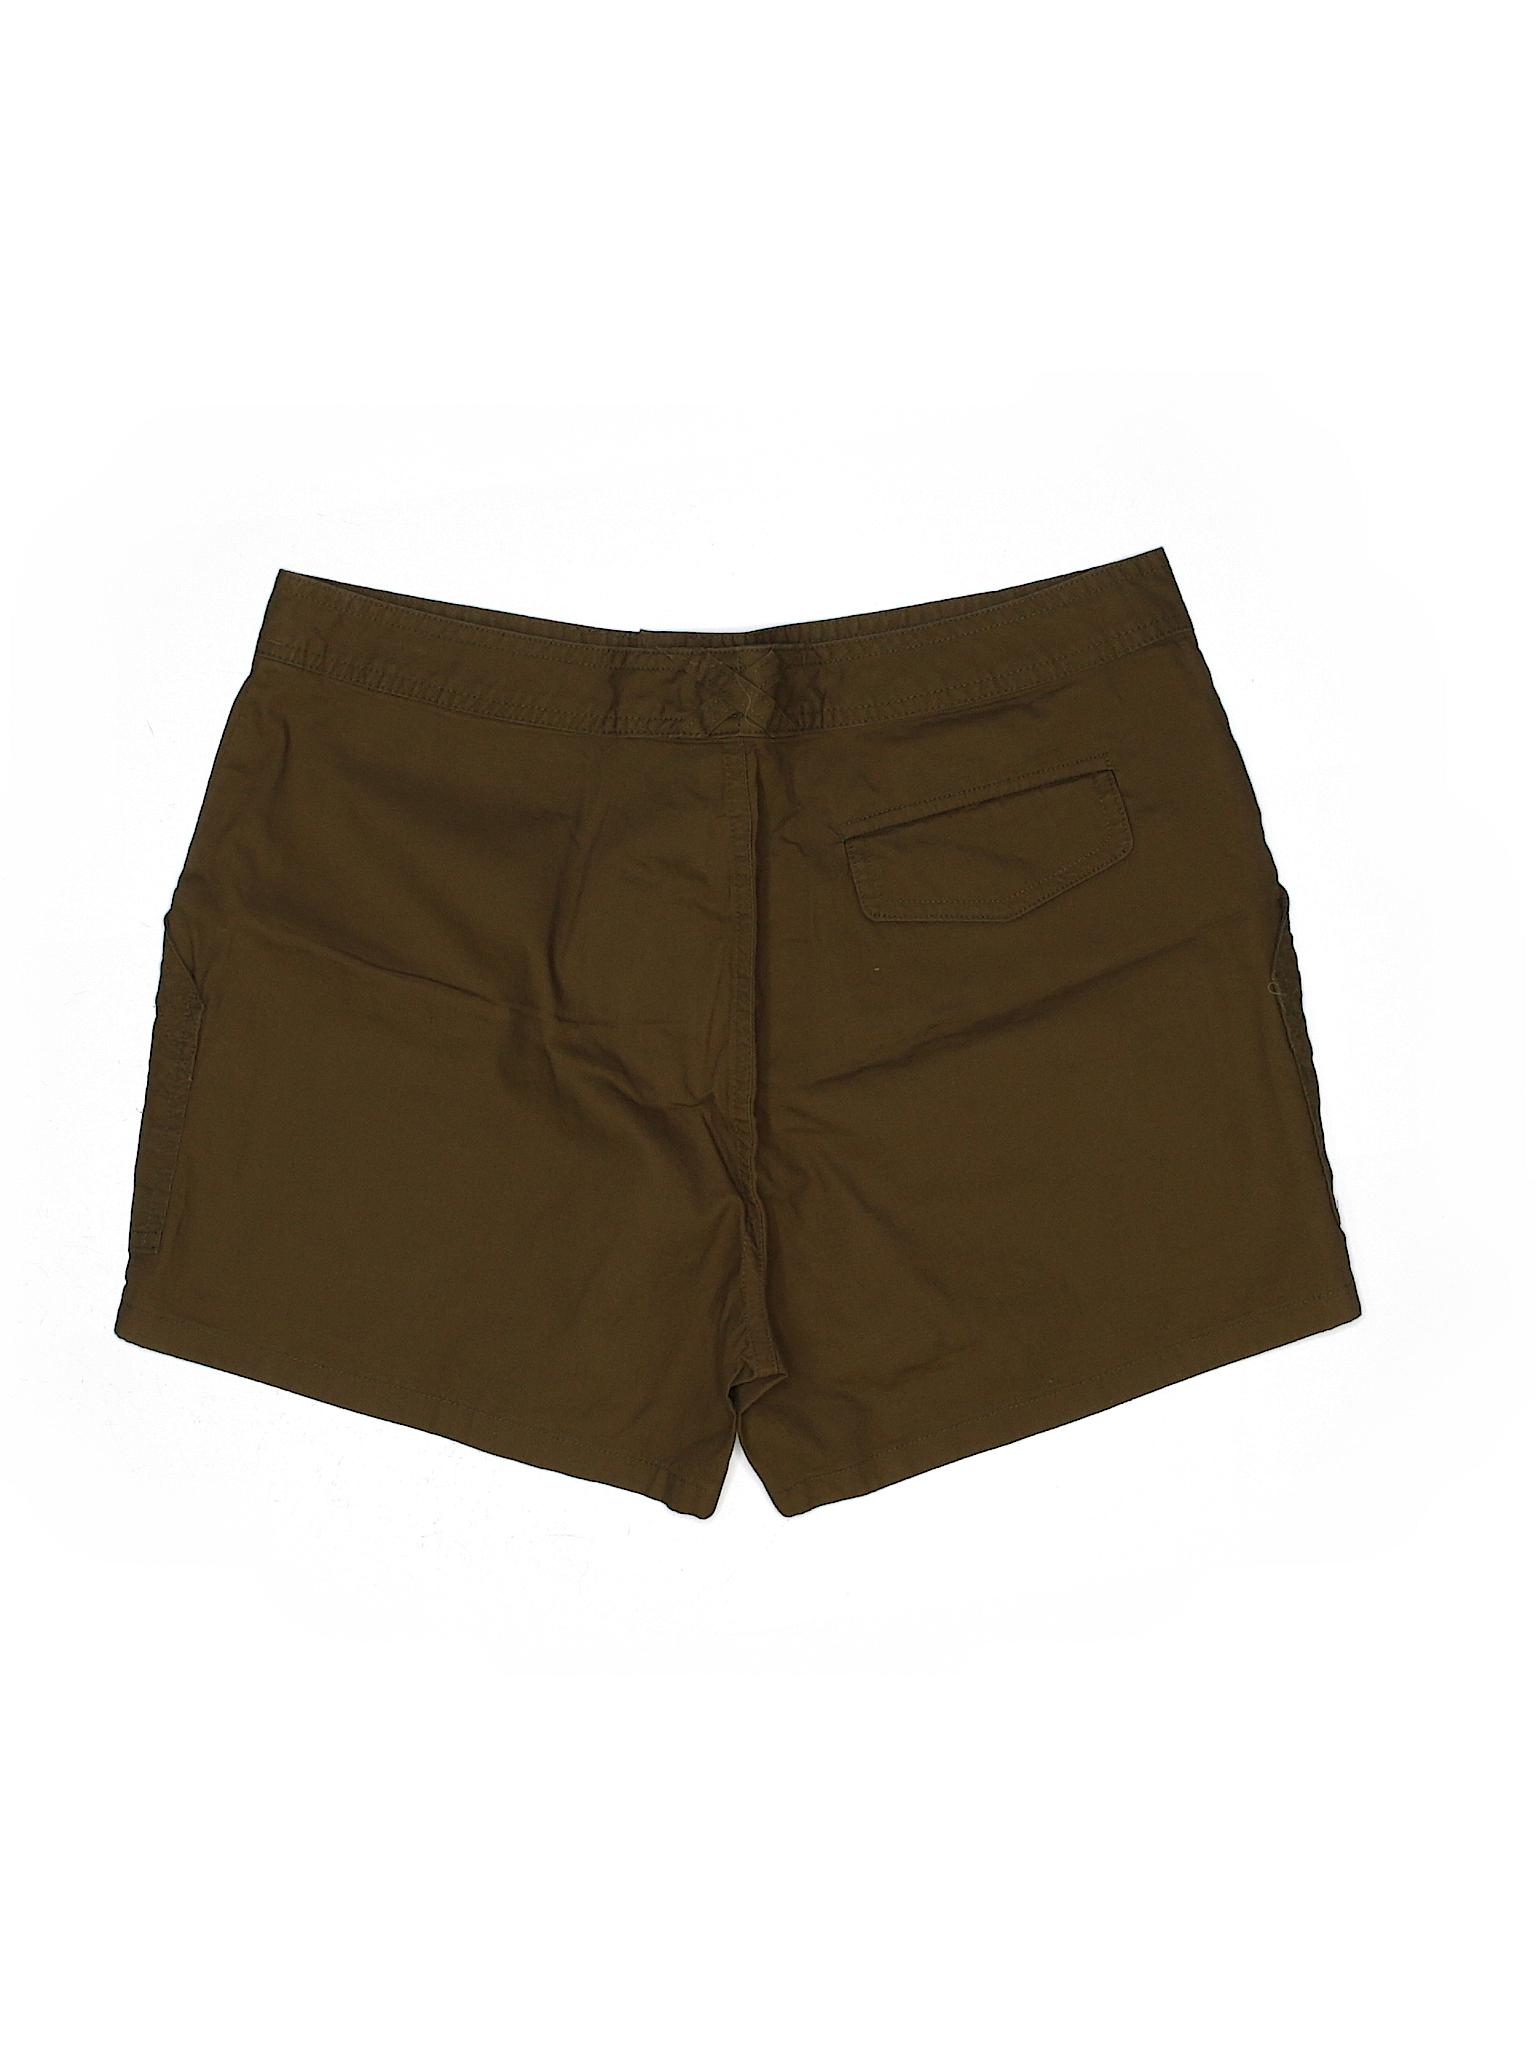 Khaki Shorts Boutique leisure Republic Banana axUnx7qwz